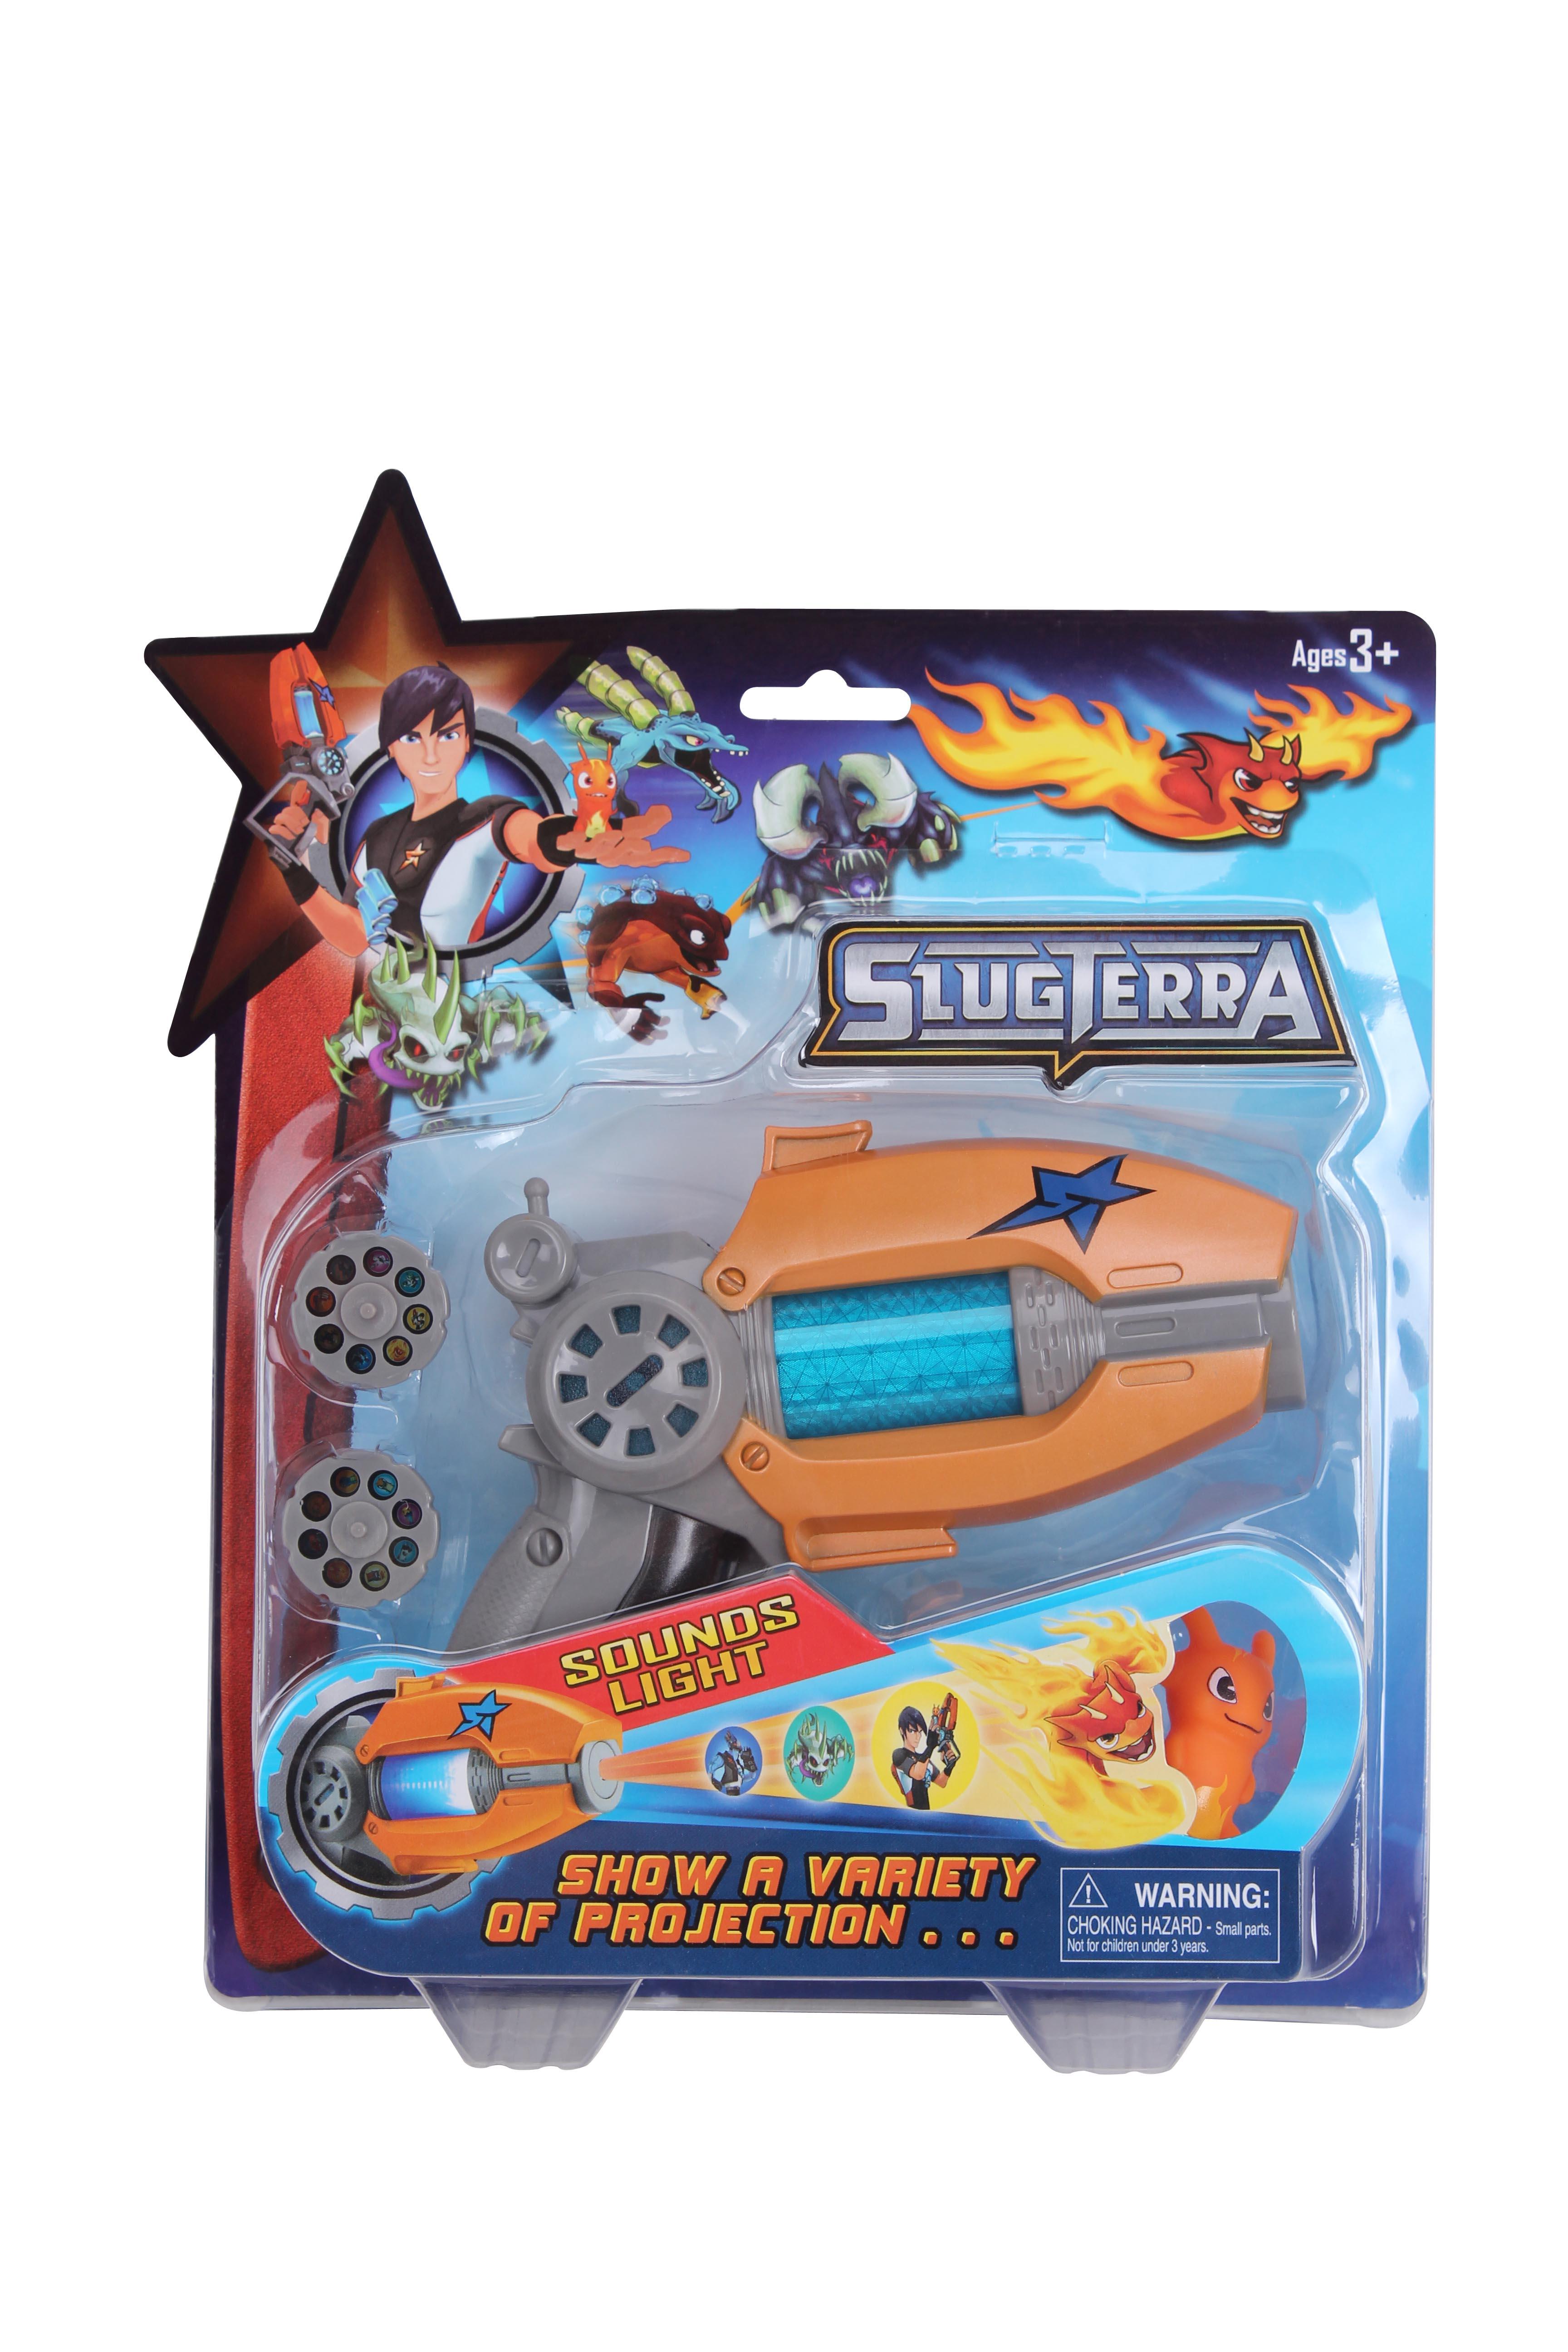 Children Gifts Slugterra Toy Projector Gun Slugterra Elves 16 Kinds Light Flash Music Projection Toy Gun Slager Elf Small Doll